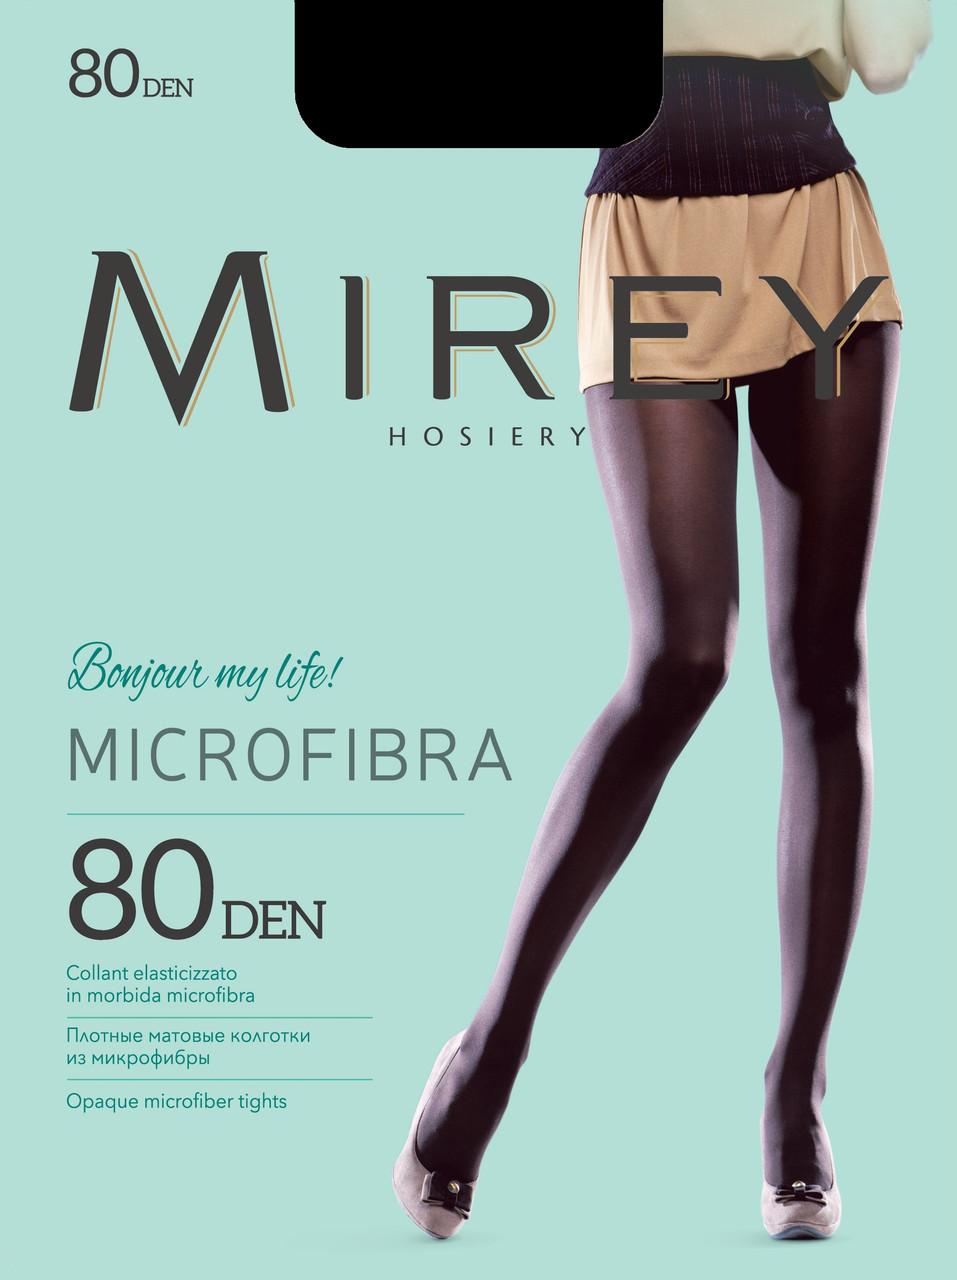 Microfibra 80 den колготи Nero Mirey (2-S) #N/A